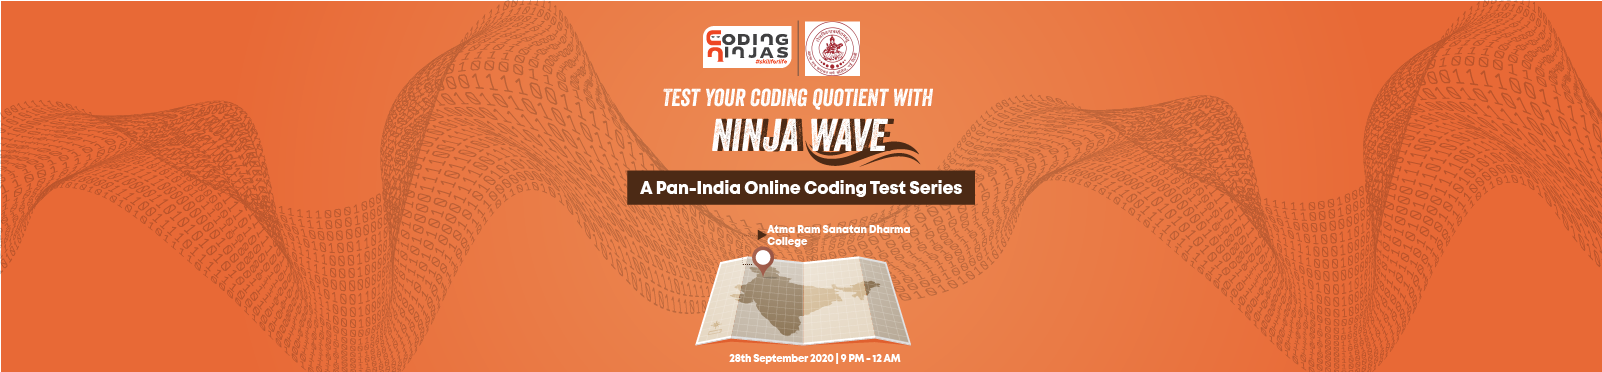 Ninja Wave at Atma Ram Sanatan Dharma College